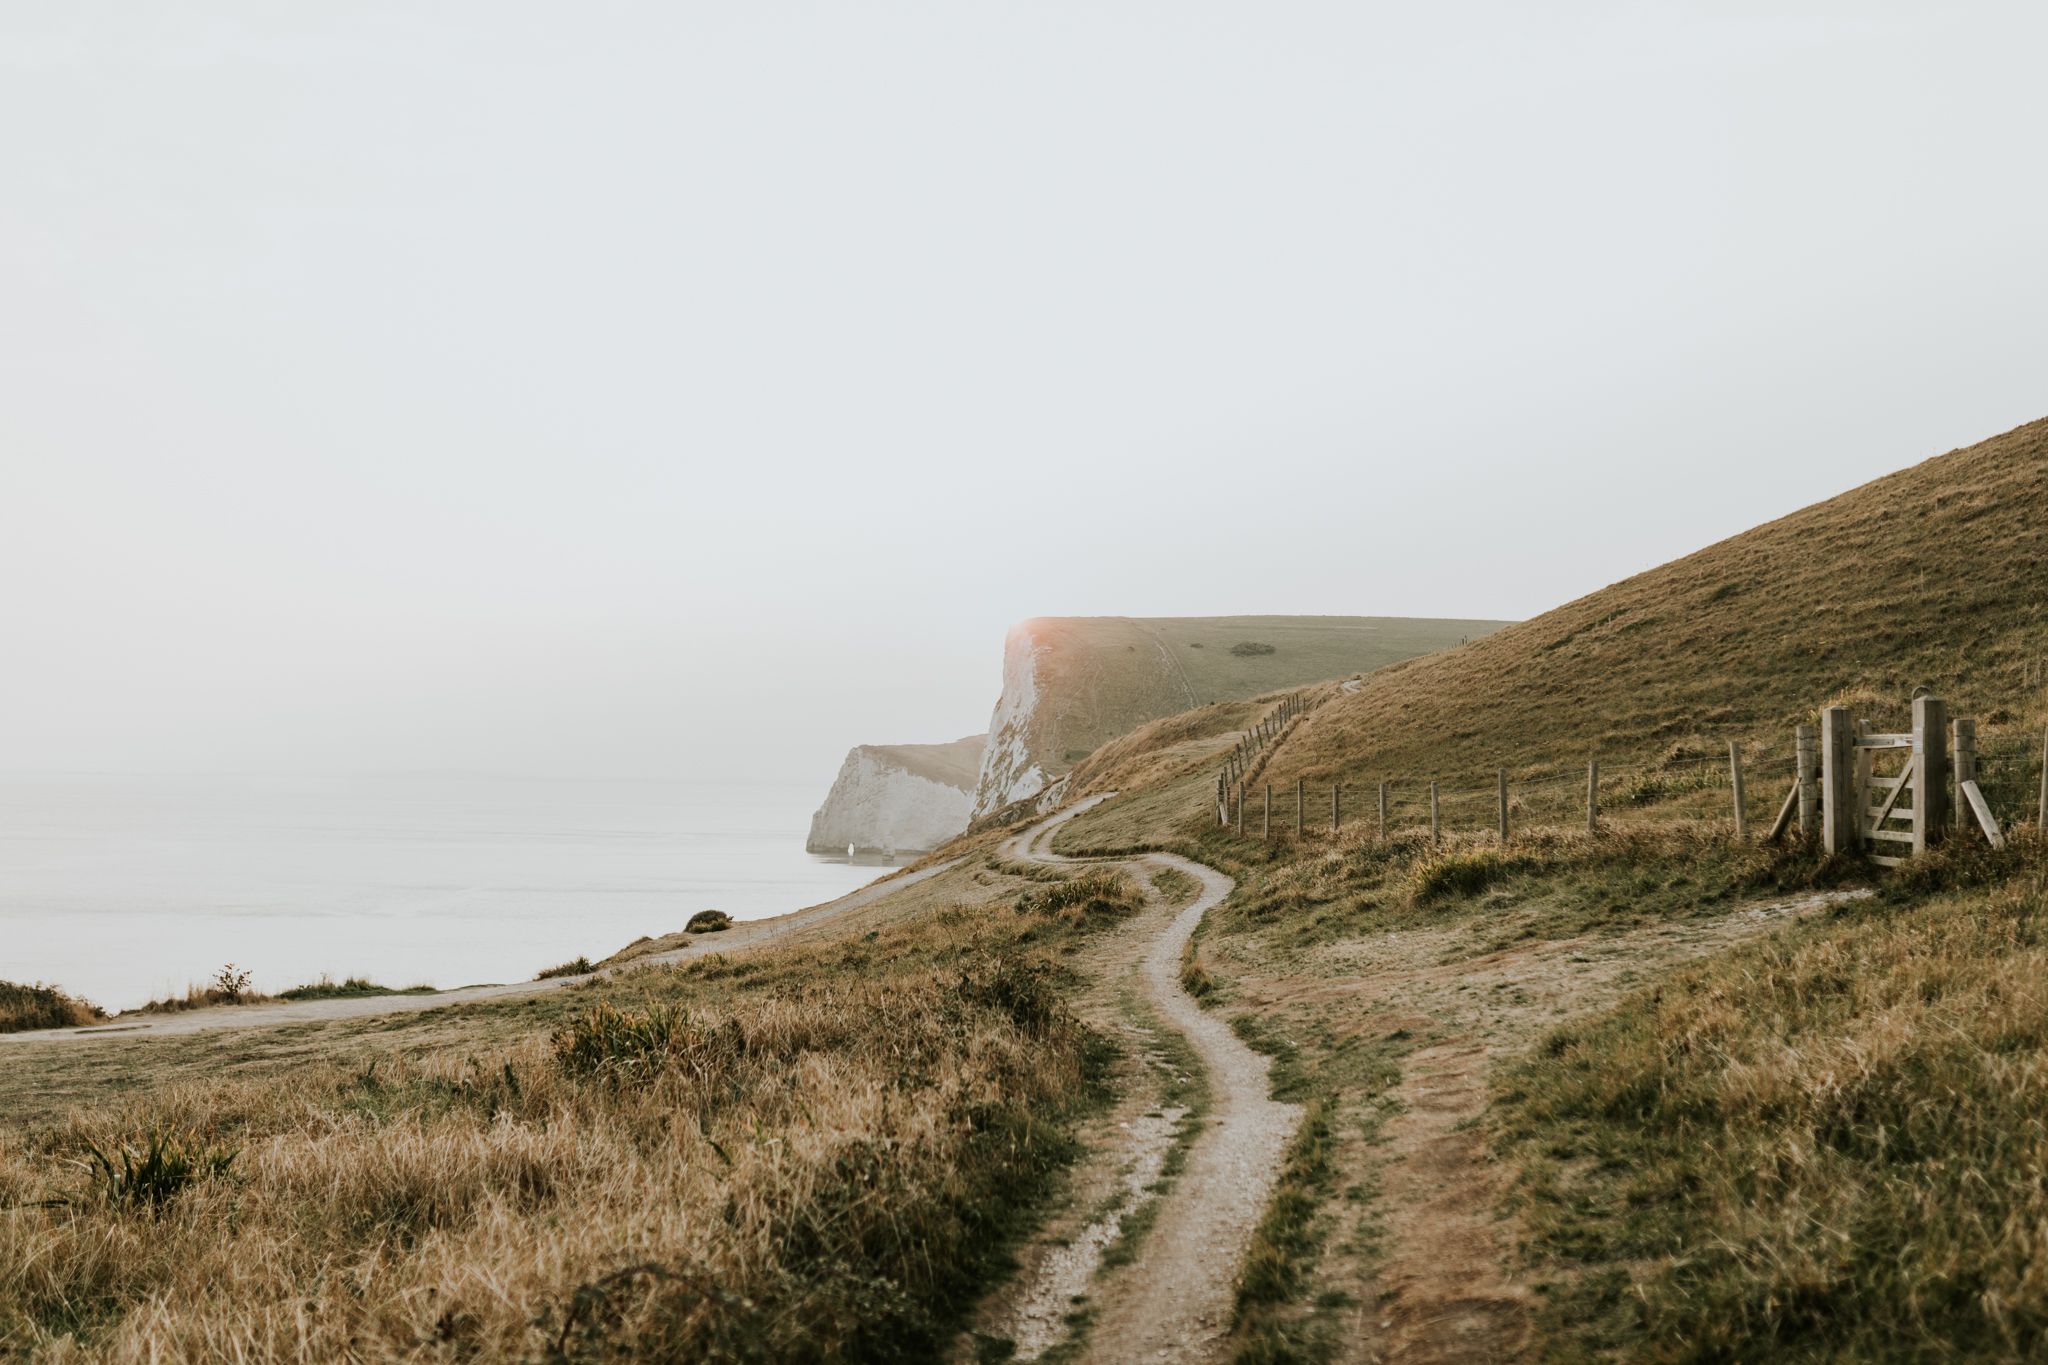 Natalie Skoric - England Travel Photography (154).jpg